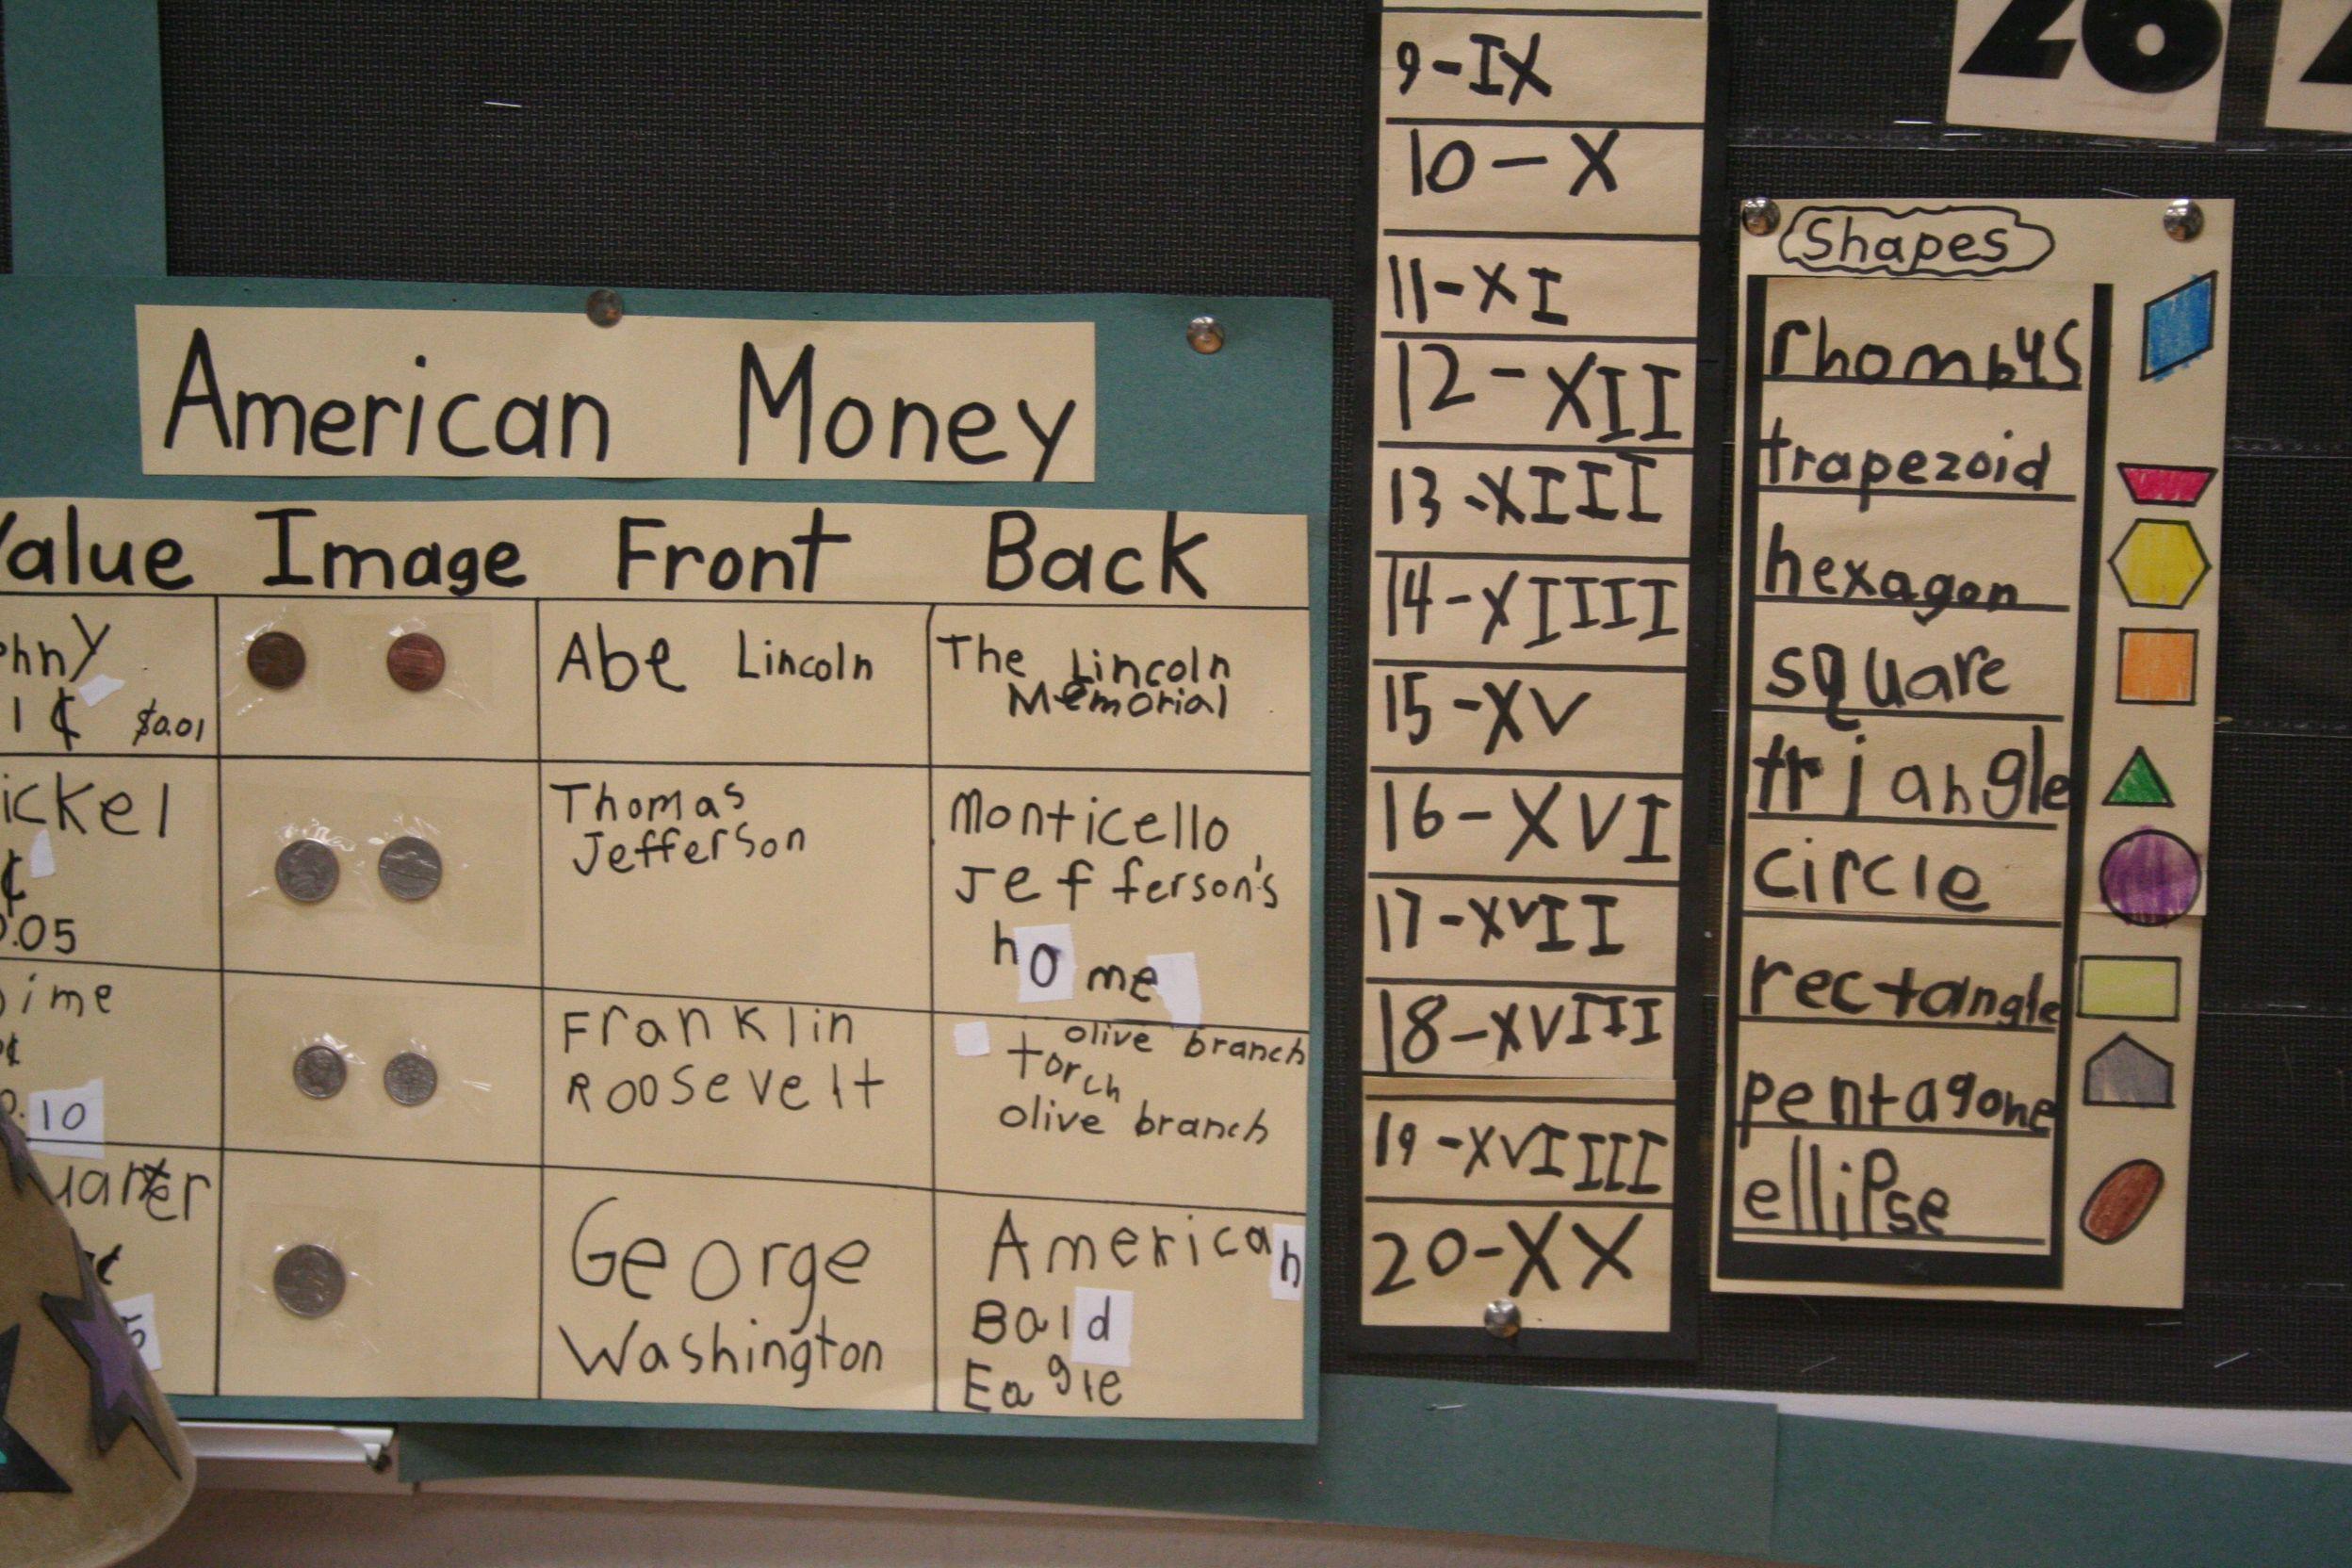 Money Roman Numerals Shapes